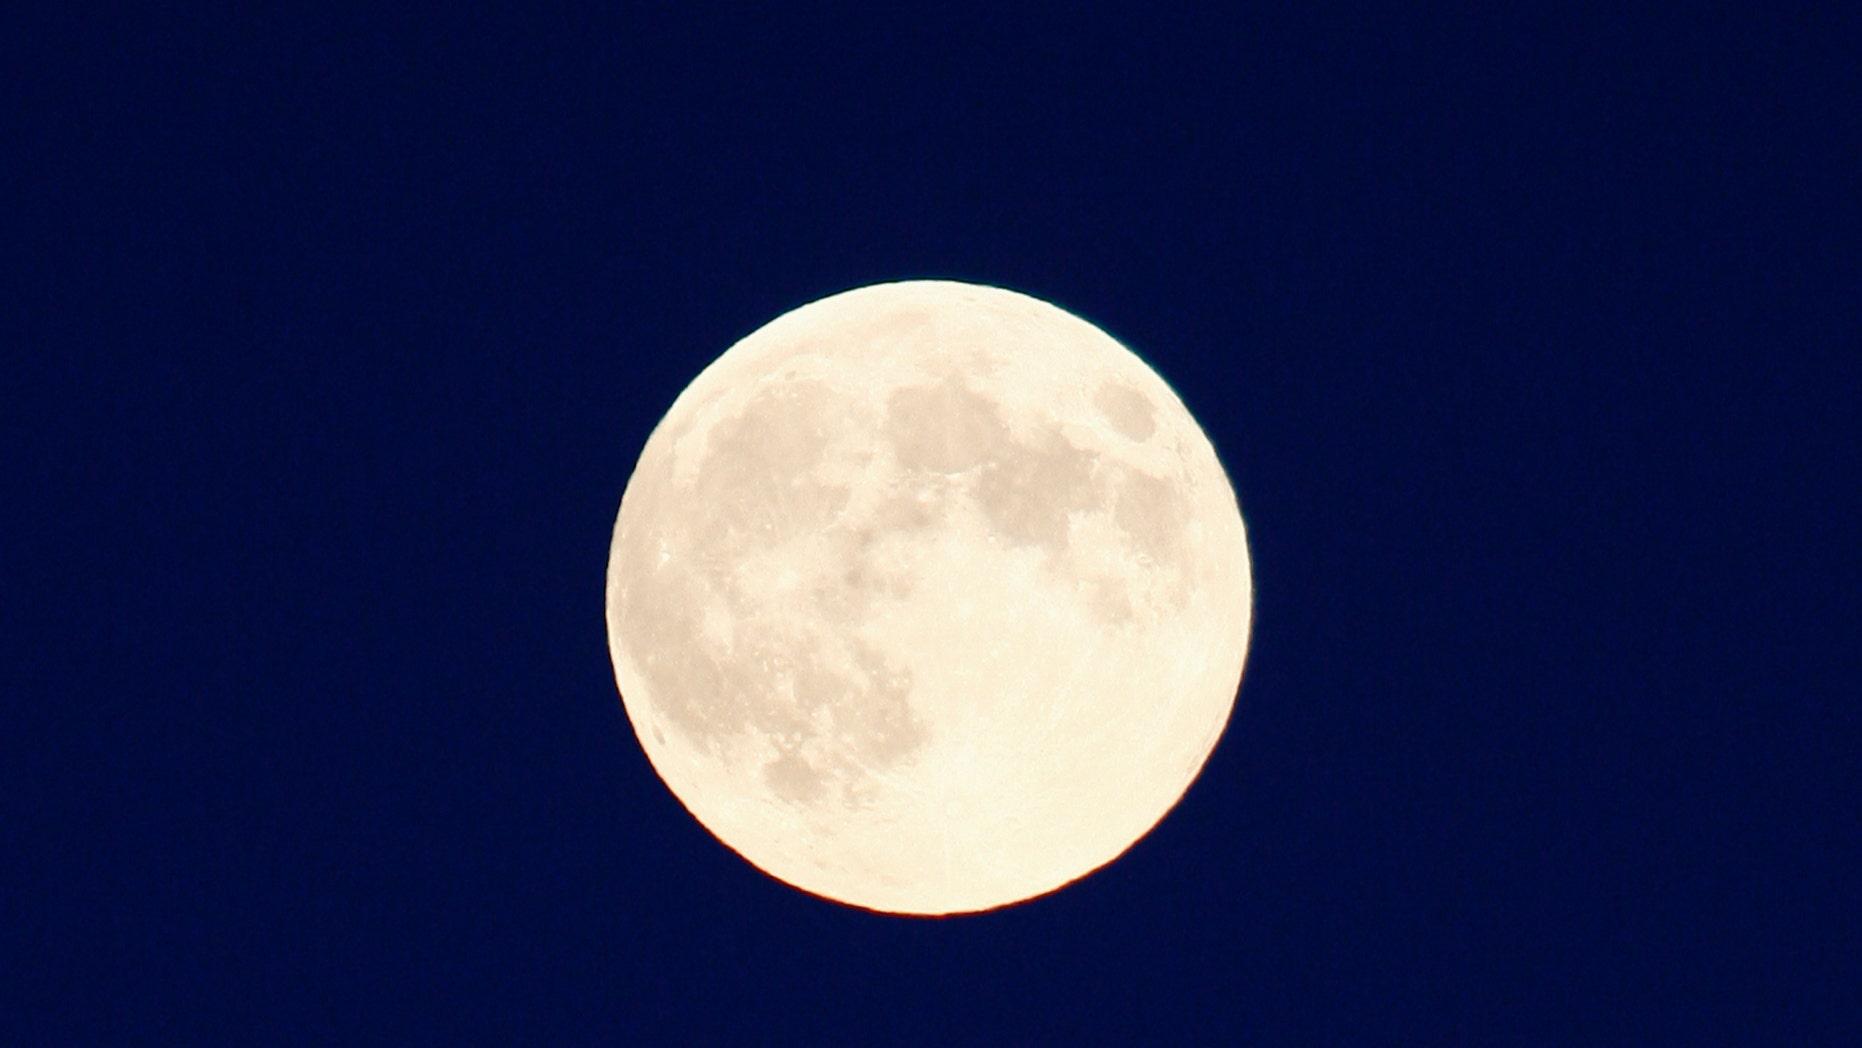 A full moon, also a harvest moon, rises over Halton Hills, Ontario outside Toronto, September 8, 2014. (REUTERS/Hyungwon Kang)